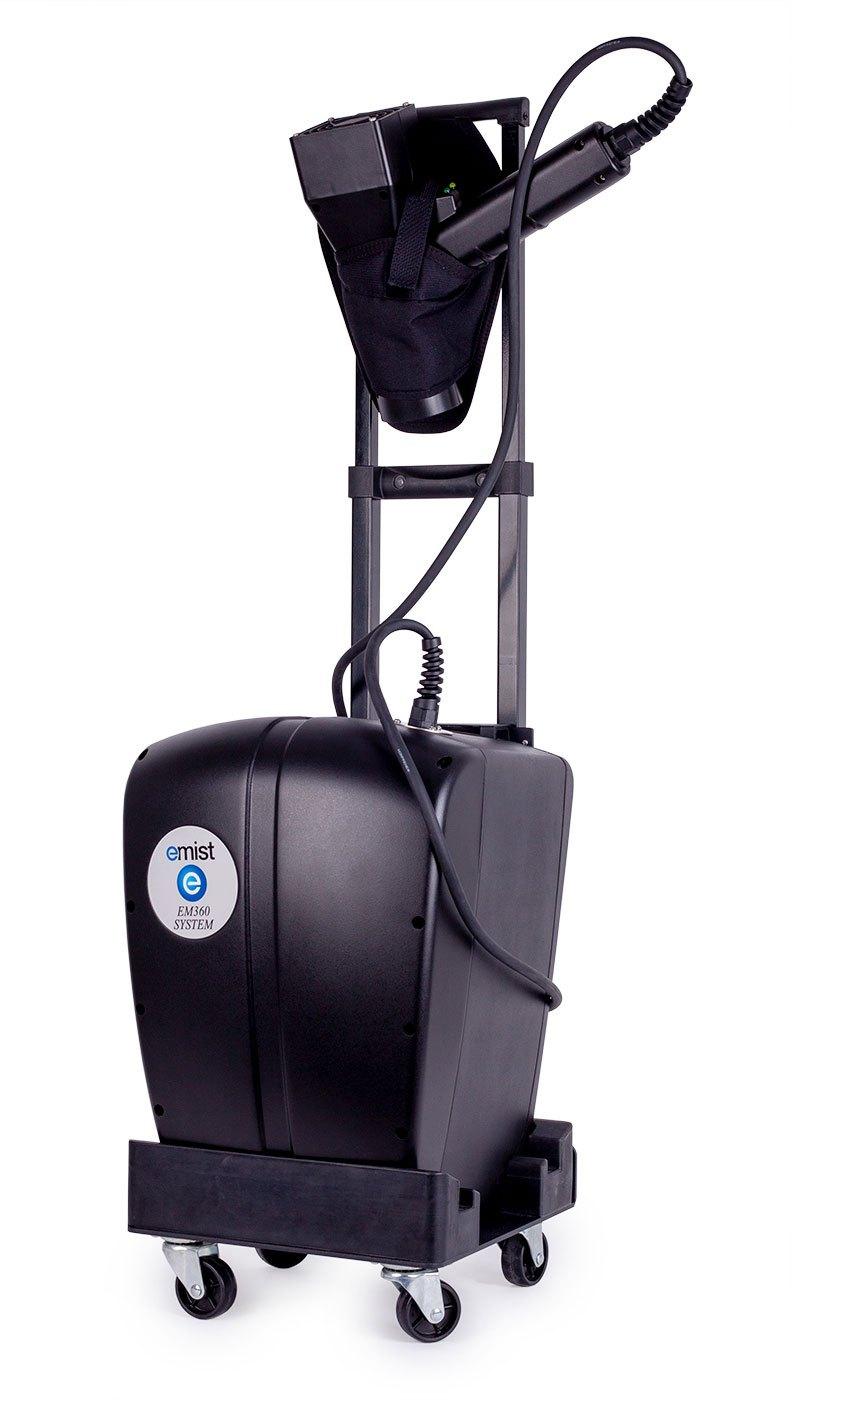 EMist_rollercart